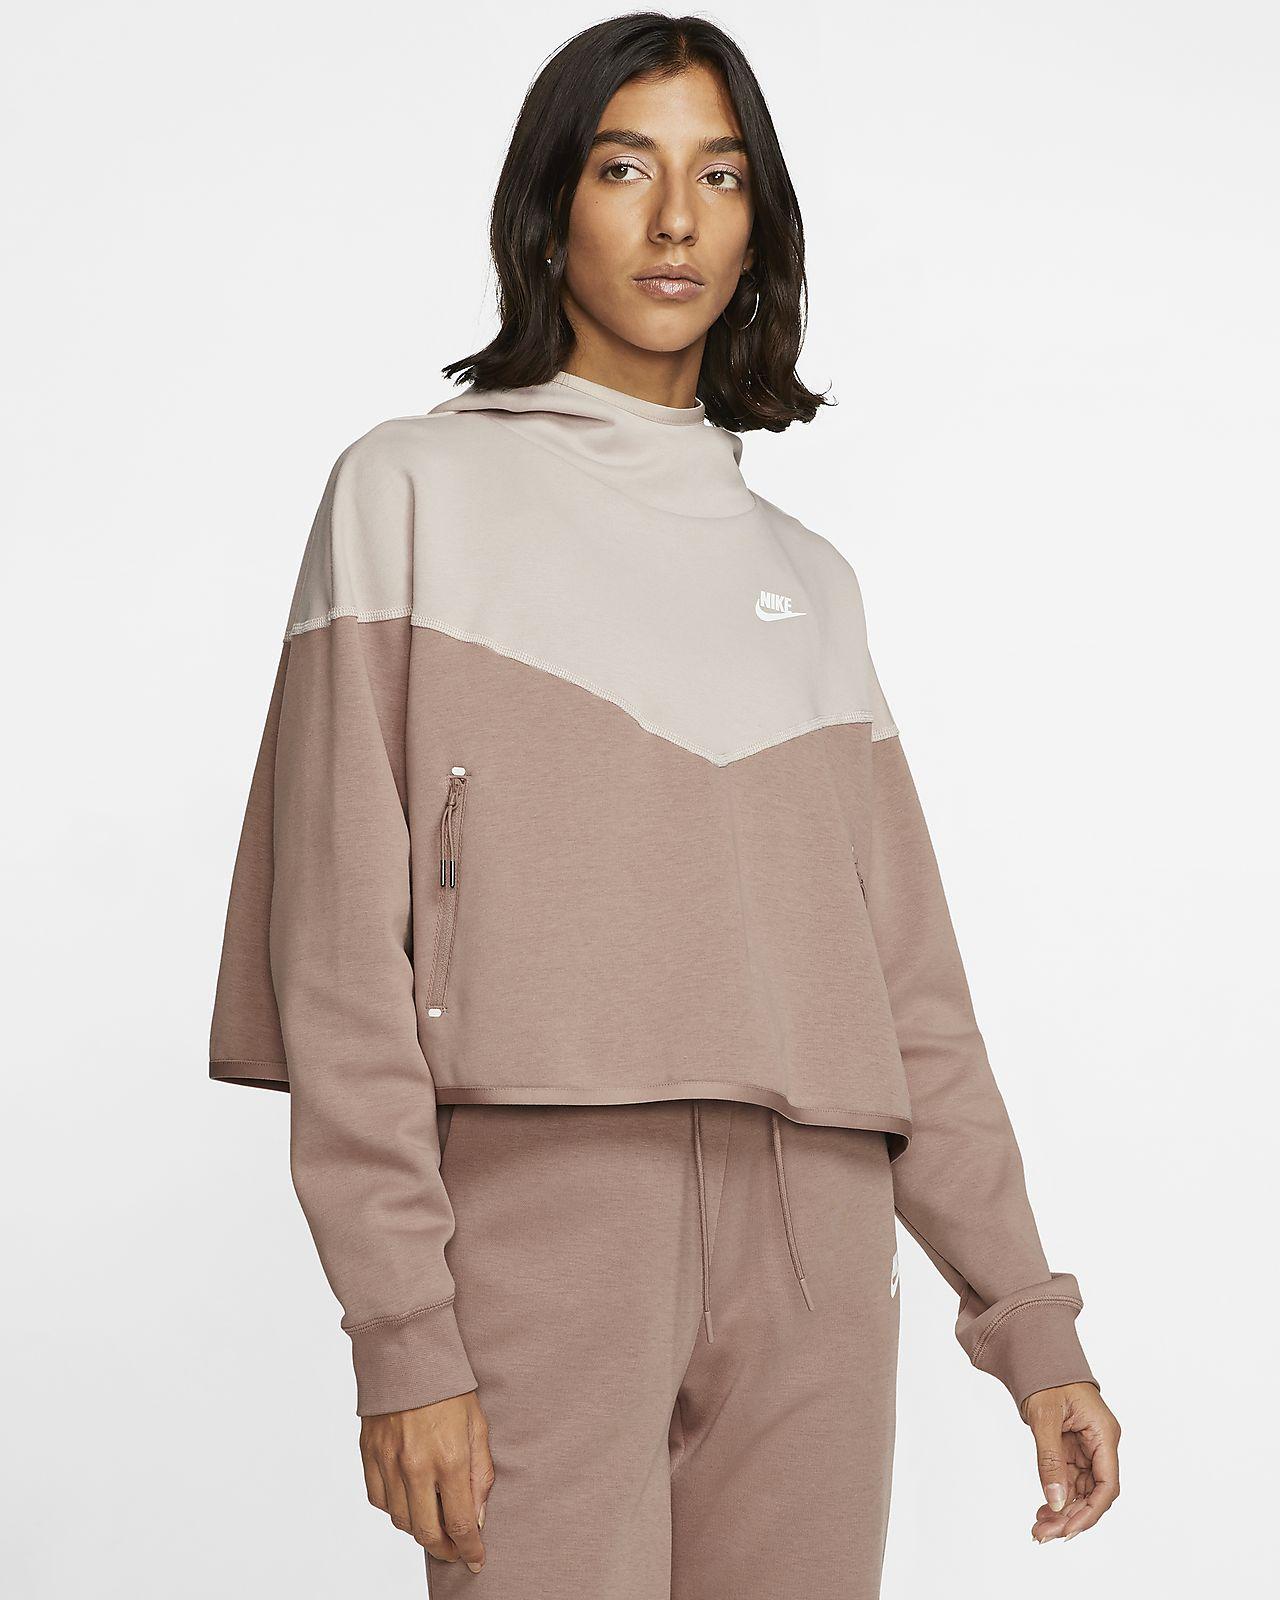 nike fleece zip up womens